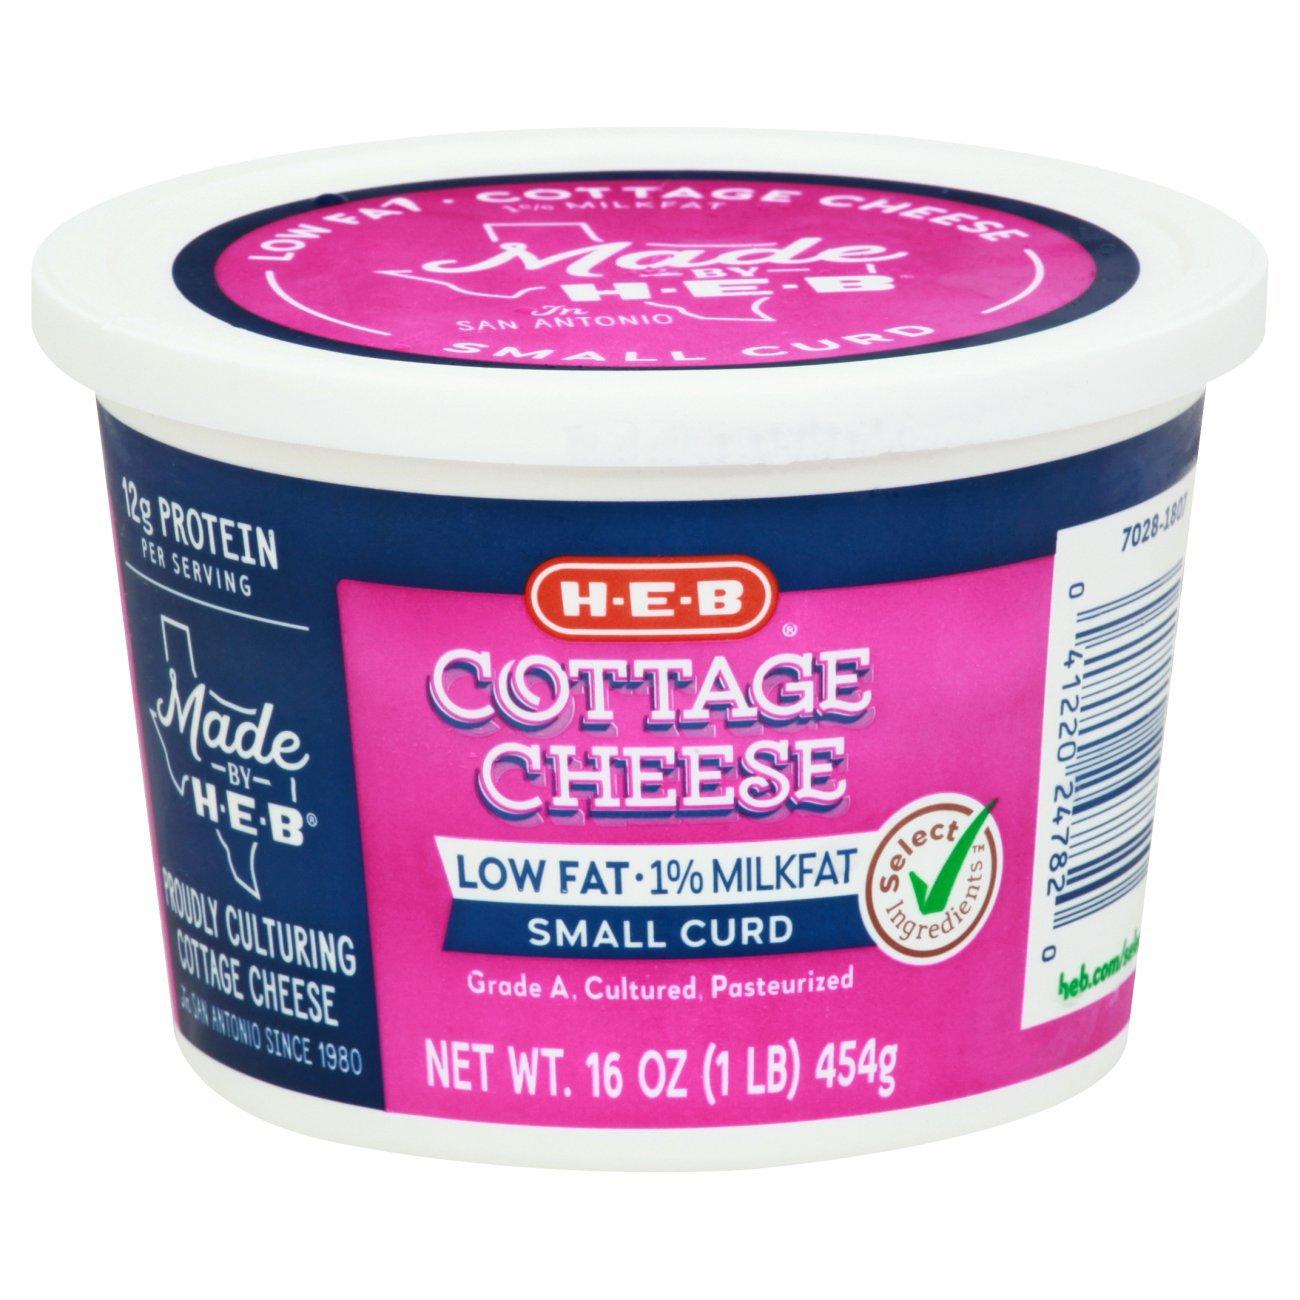 h u2011e u2011b low fat 1 milkfat cottage cheese u2011 shop cottage cheese at h u2011e u2011b rh heb com fat content in cottage cheese fat free cottage cheese aldi